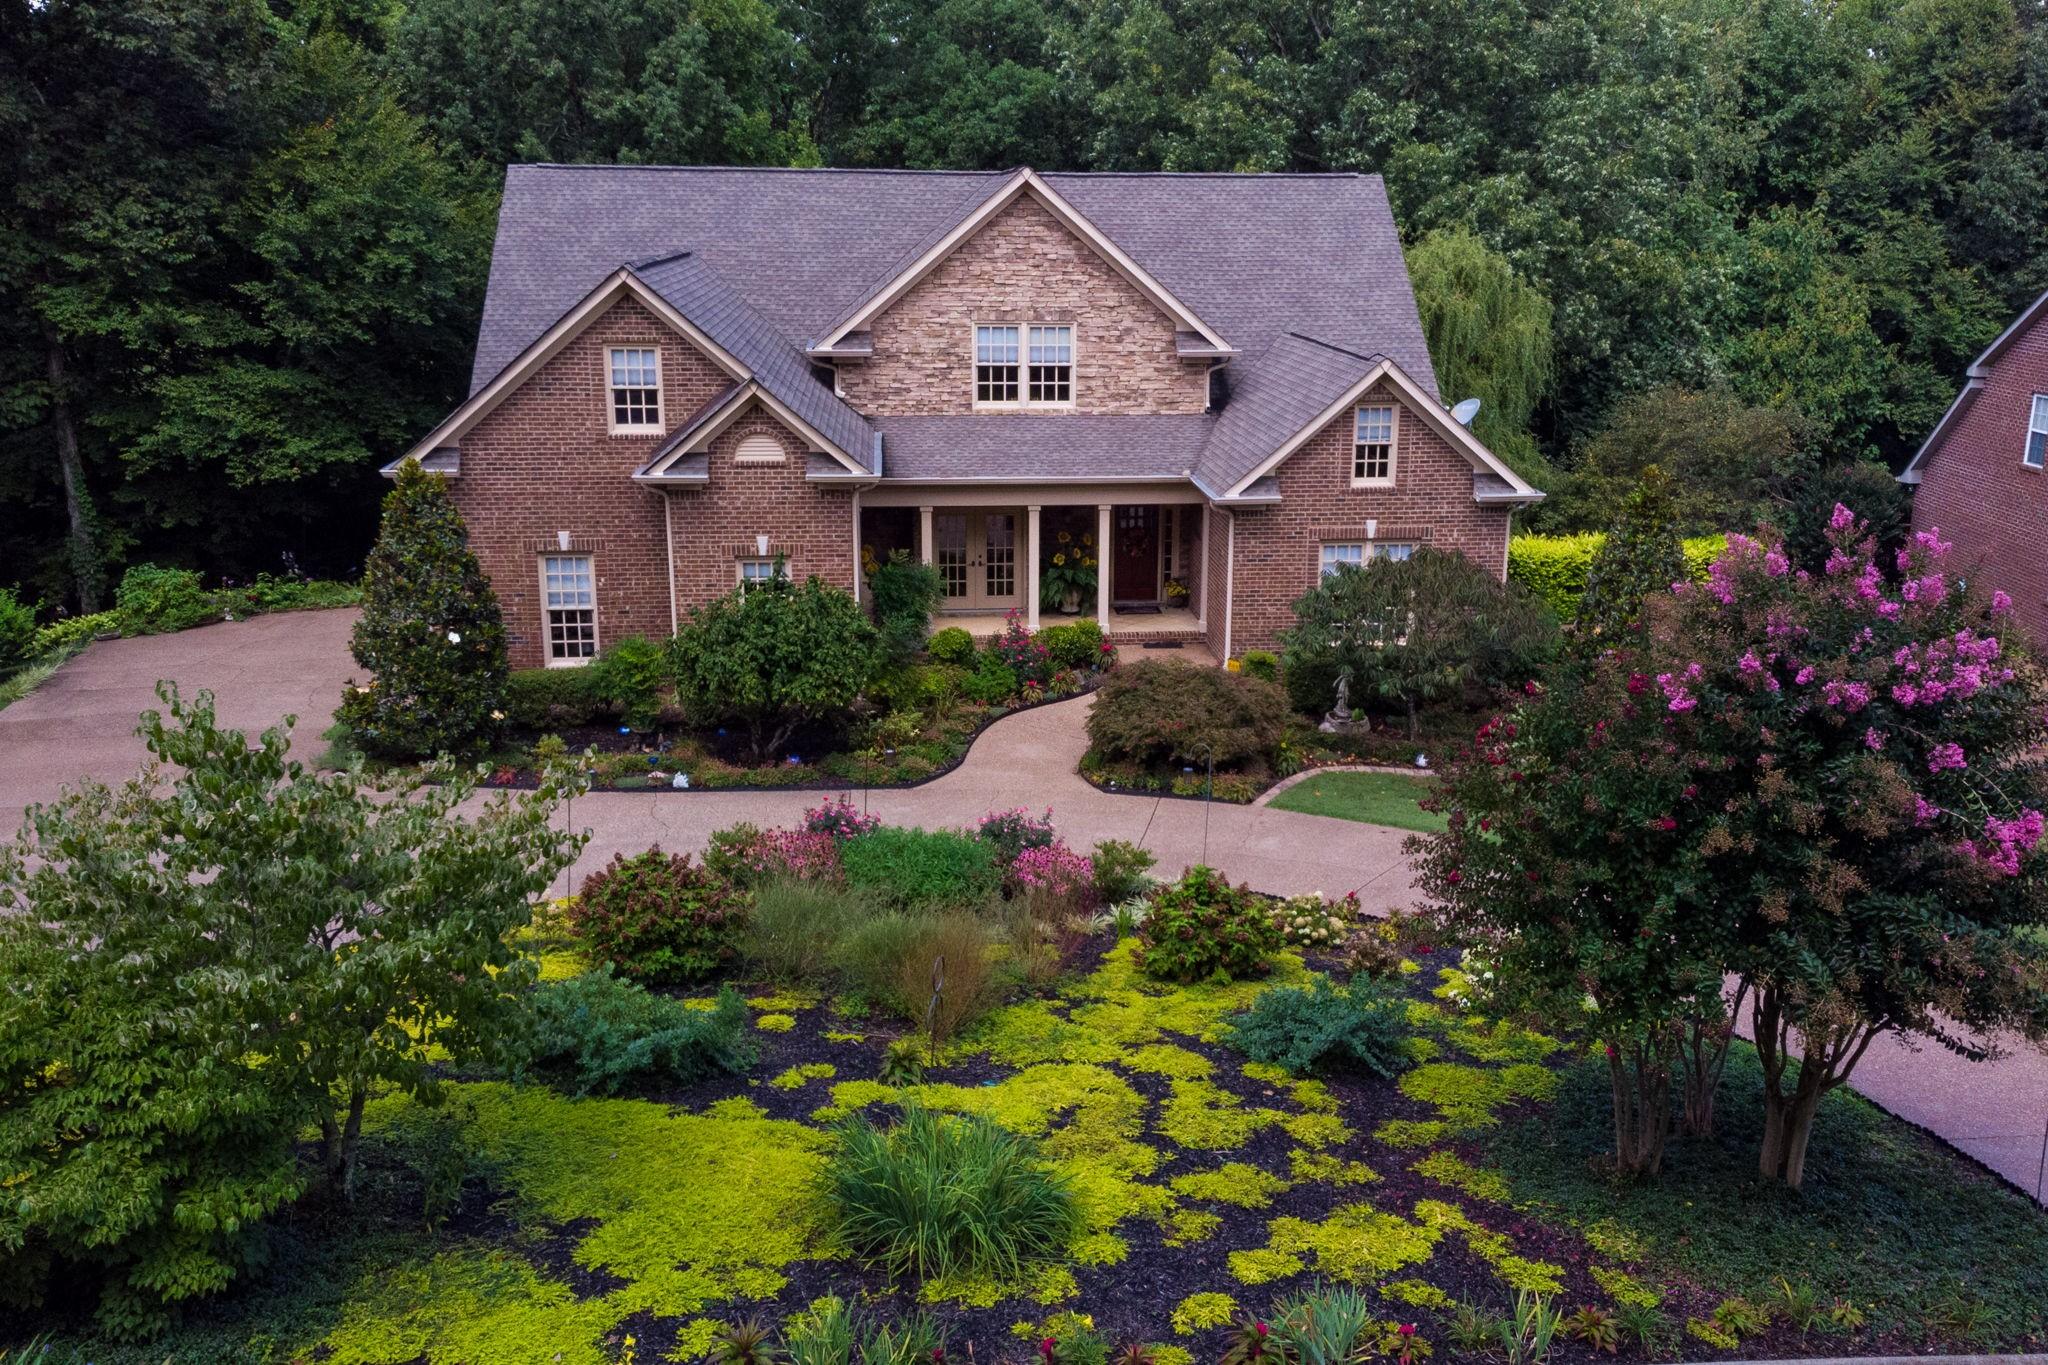 529 Strudwick Dr Property Photo - Goodlettsville, TN real estate listing